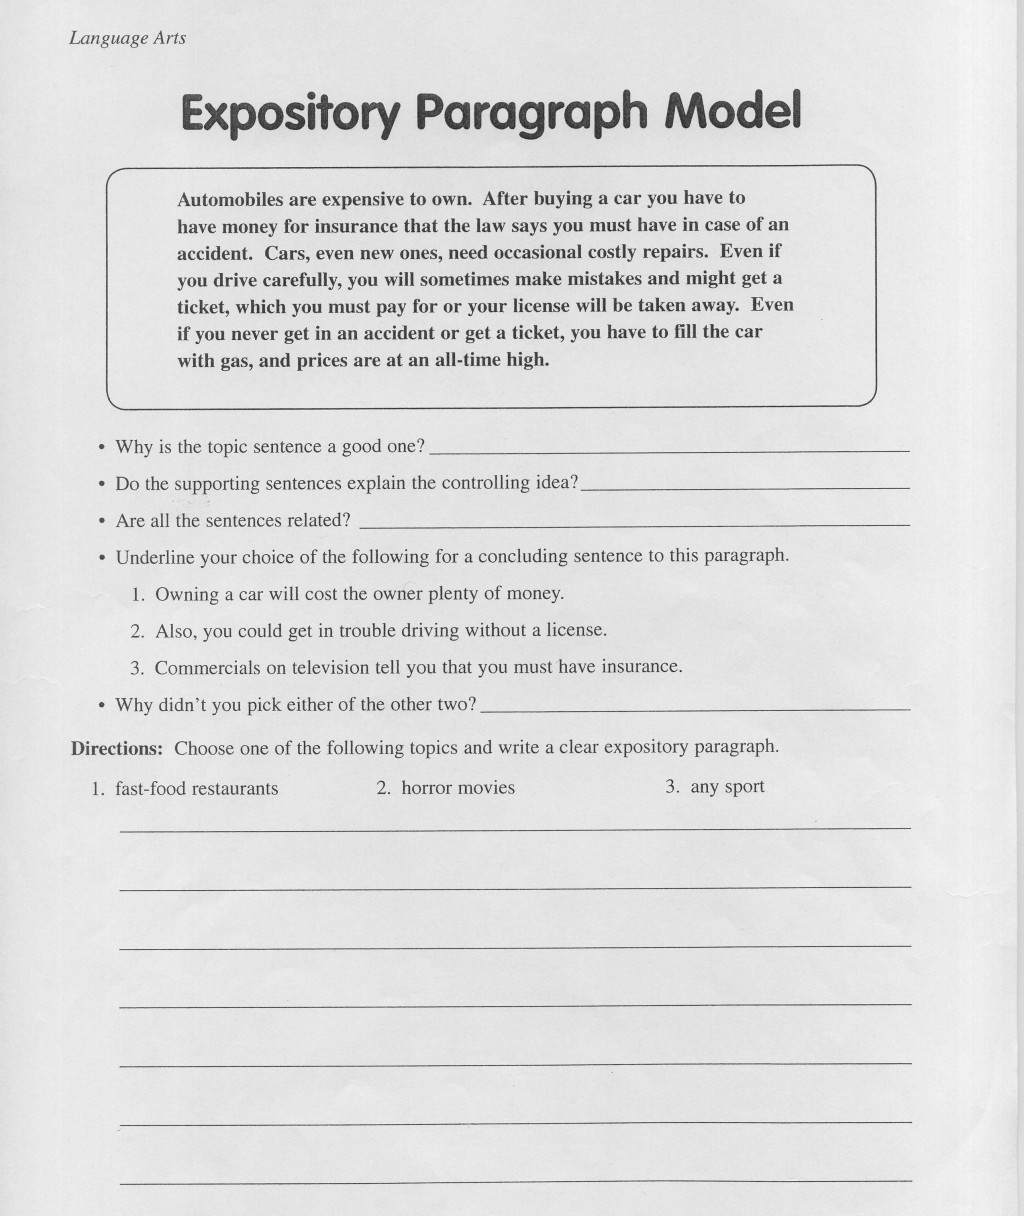 018 Essay Example 6th Grade Argumentative Shocking Examples Persuasive Large